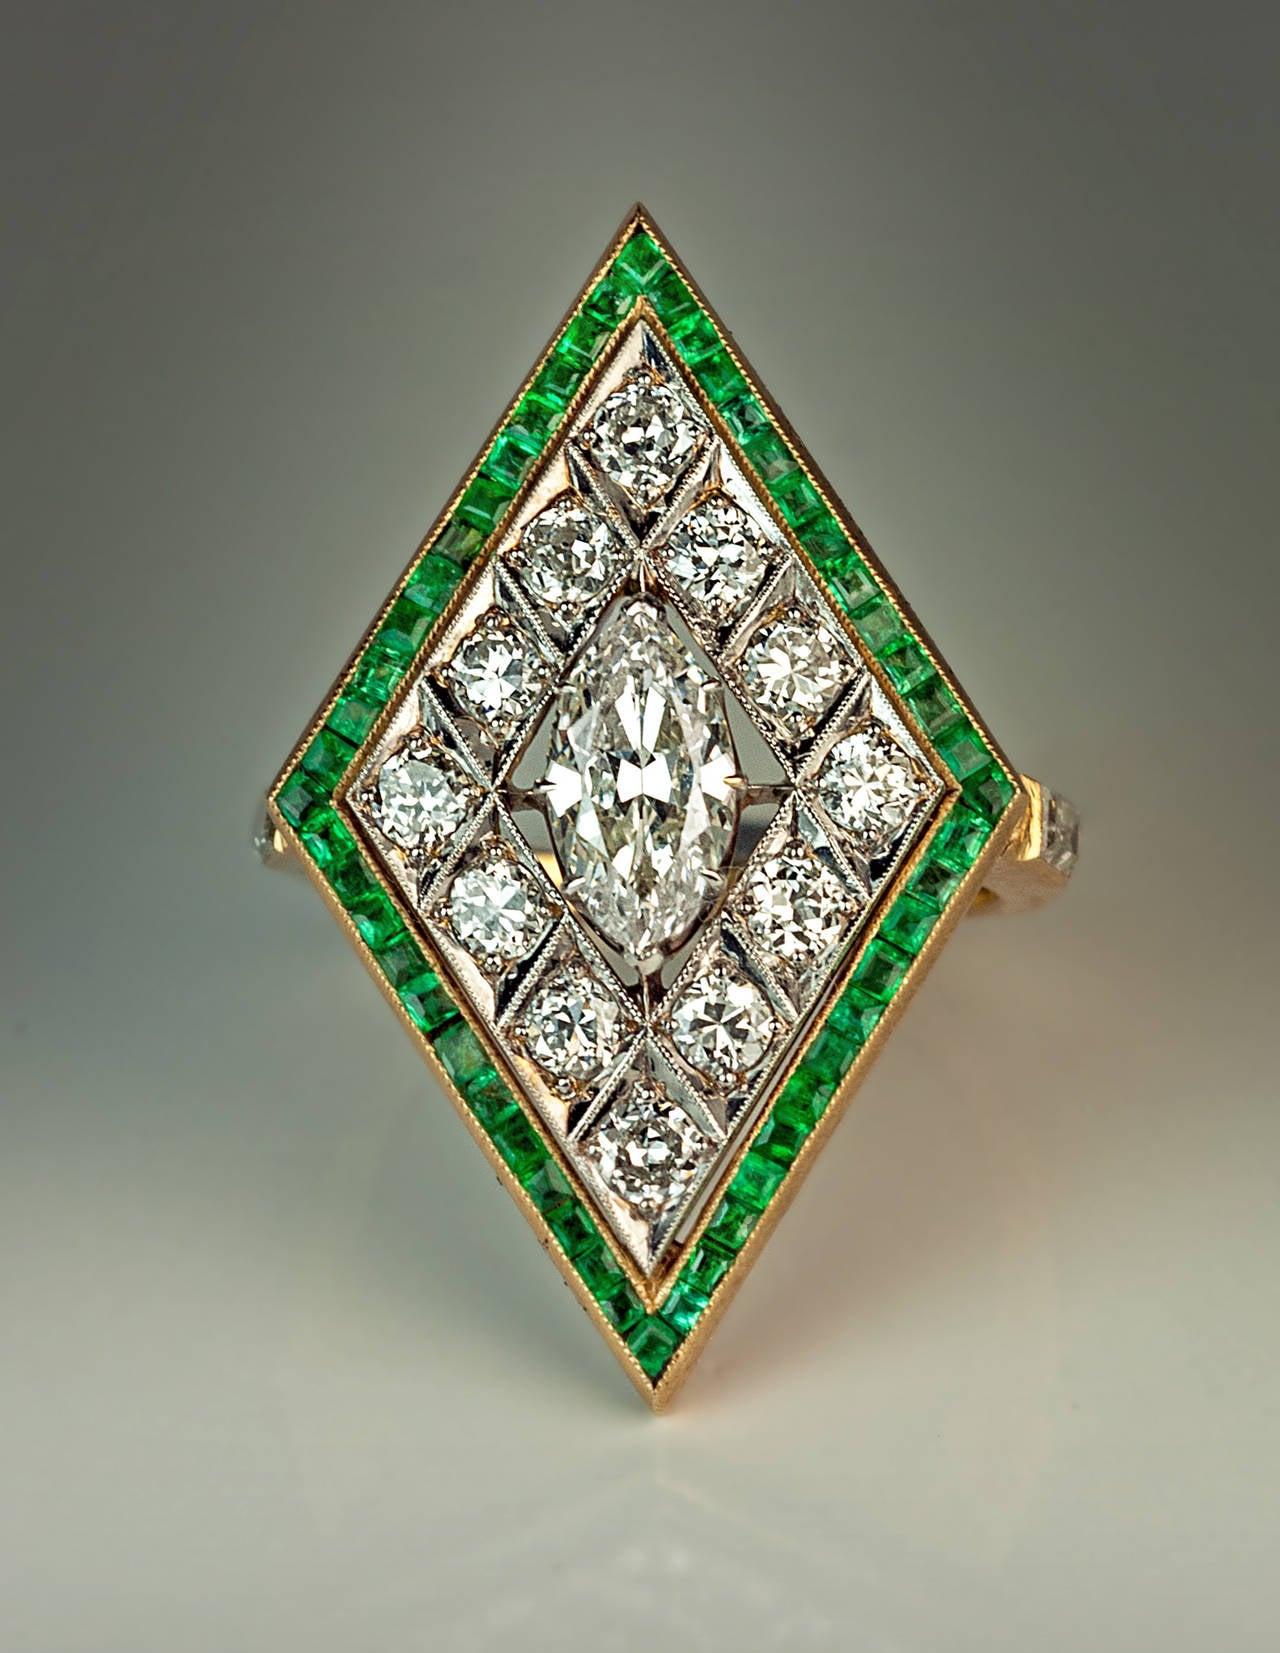 Art Deco Rhombus Shaped Diamond Emerald Gold Ring For Sale 3